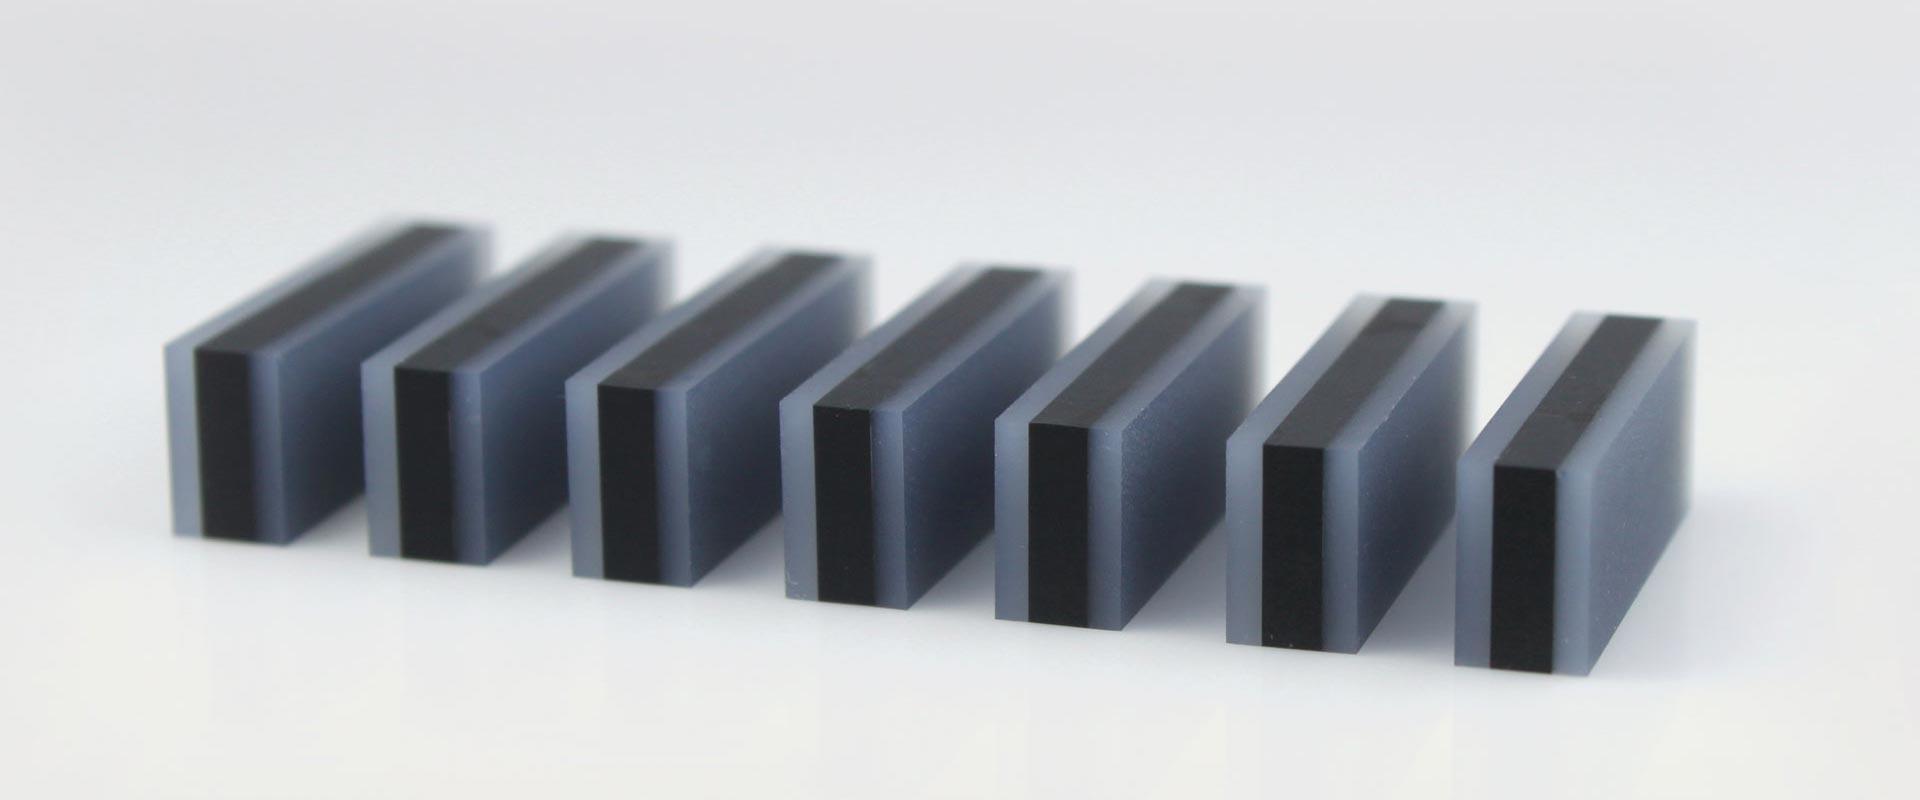 Konnektoren 16 - ELGRO Technology GmbH